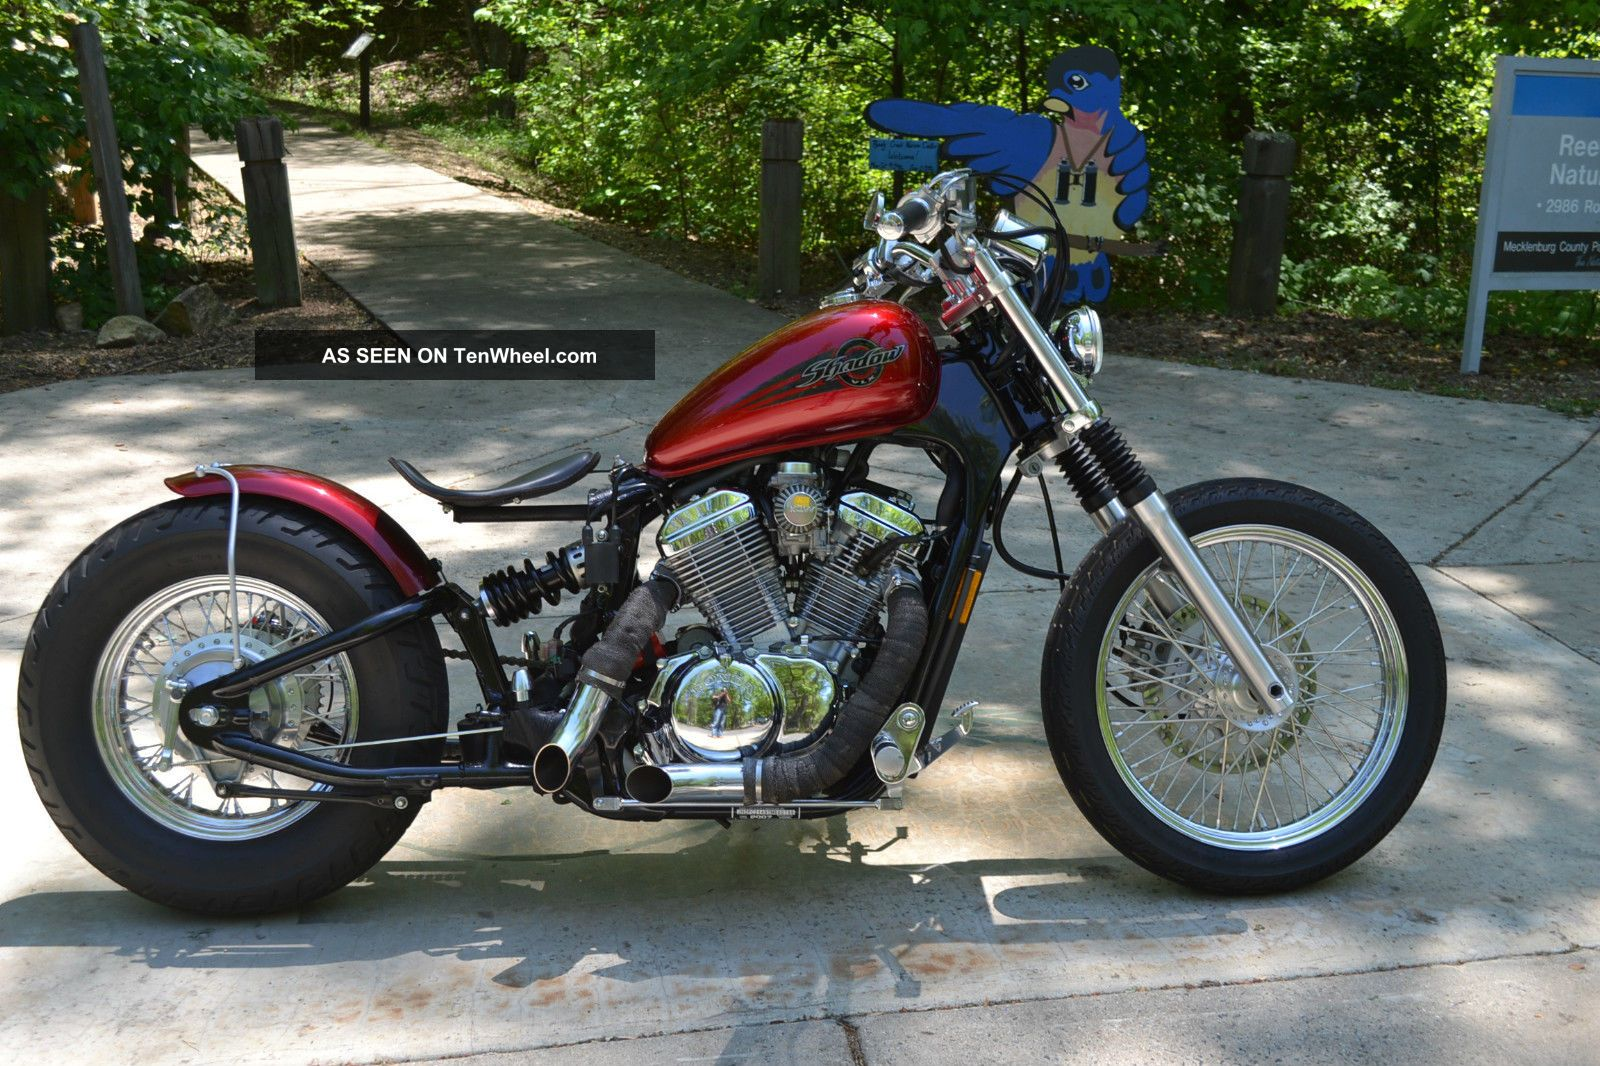 American Ironhorse Wiring Diagram  Honda Shadow 2007 Vlx600c Bobber Full Customized